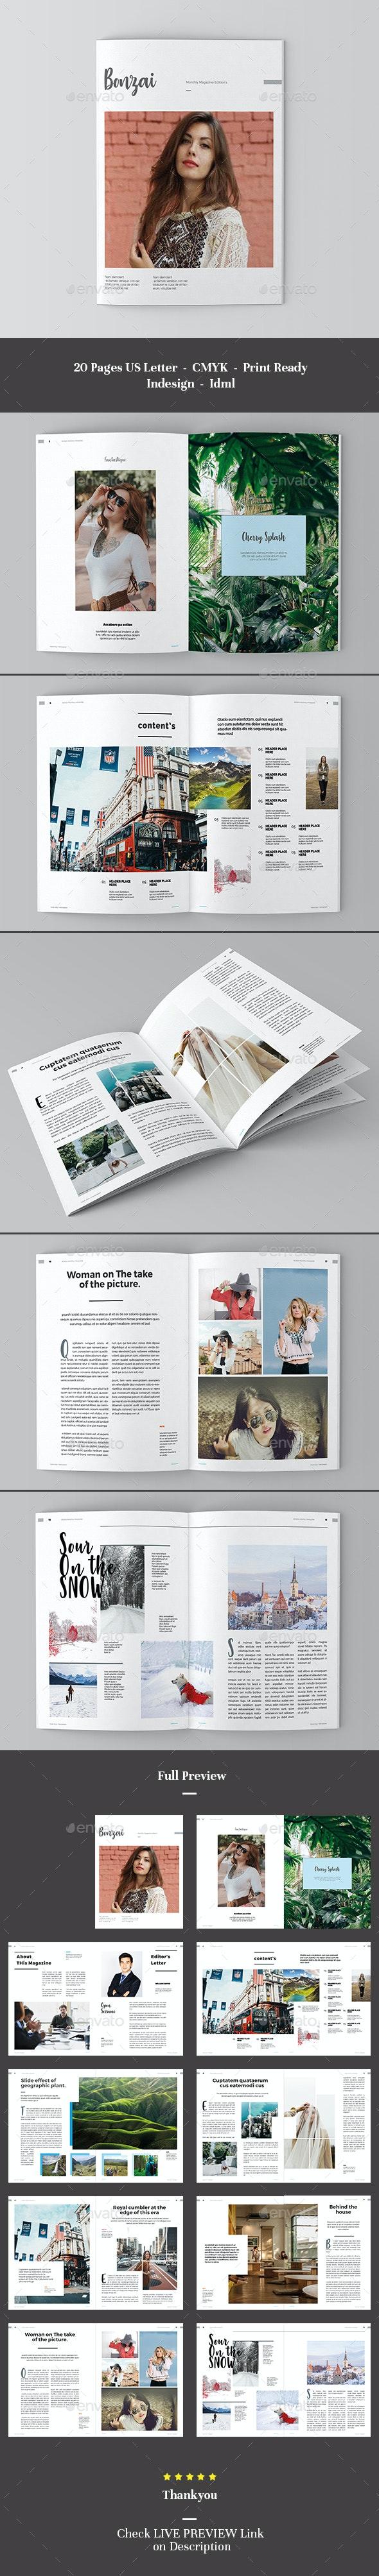 Bonzai Magazine - Magazines Print Templates